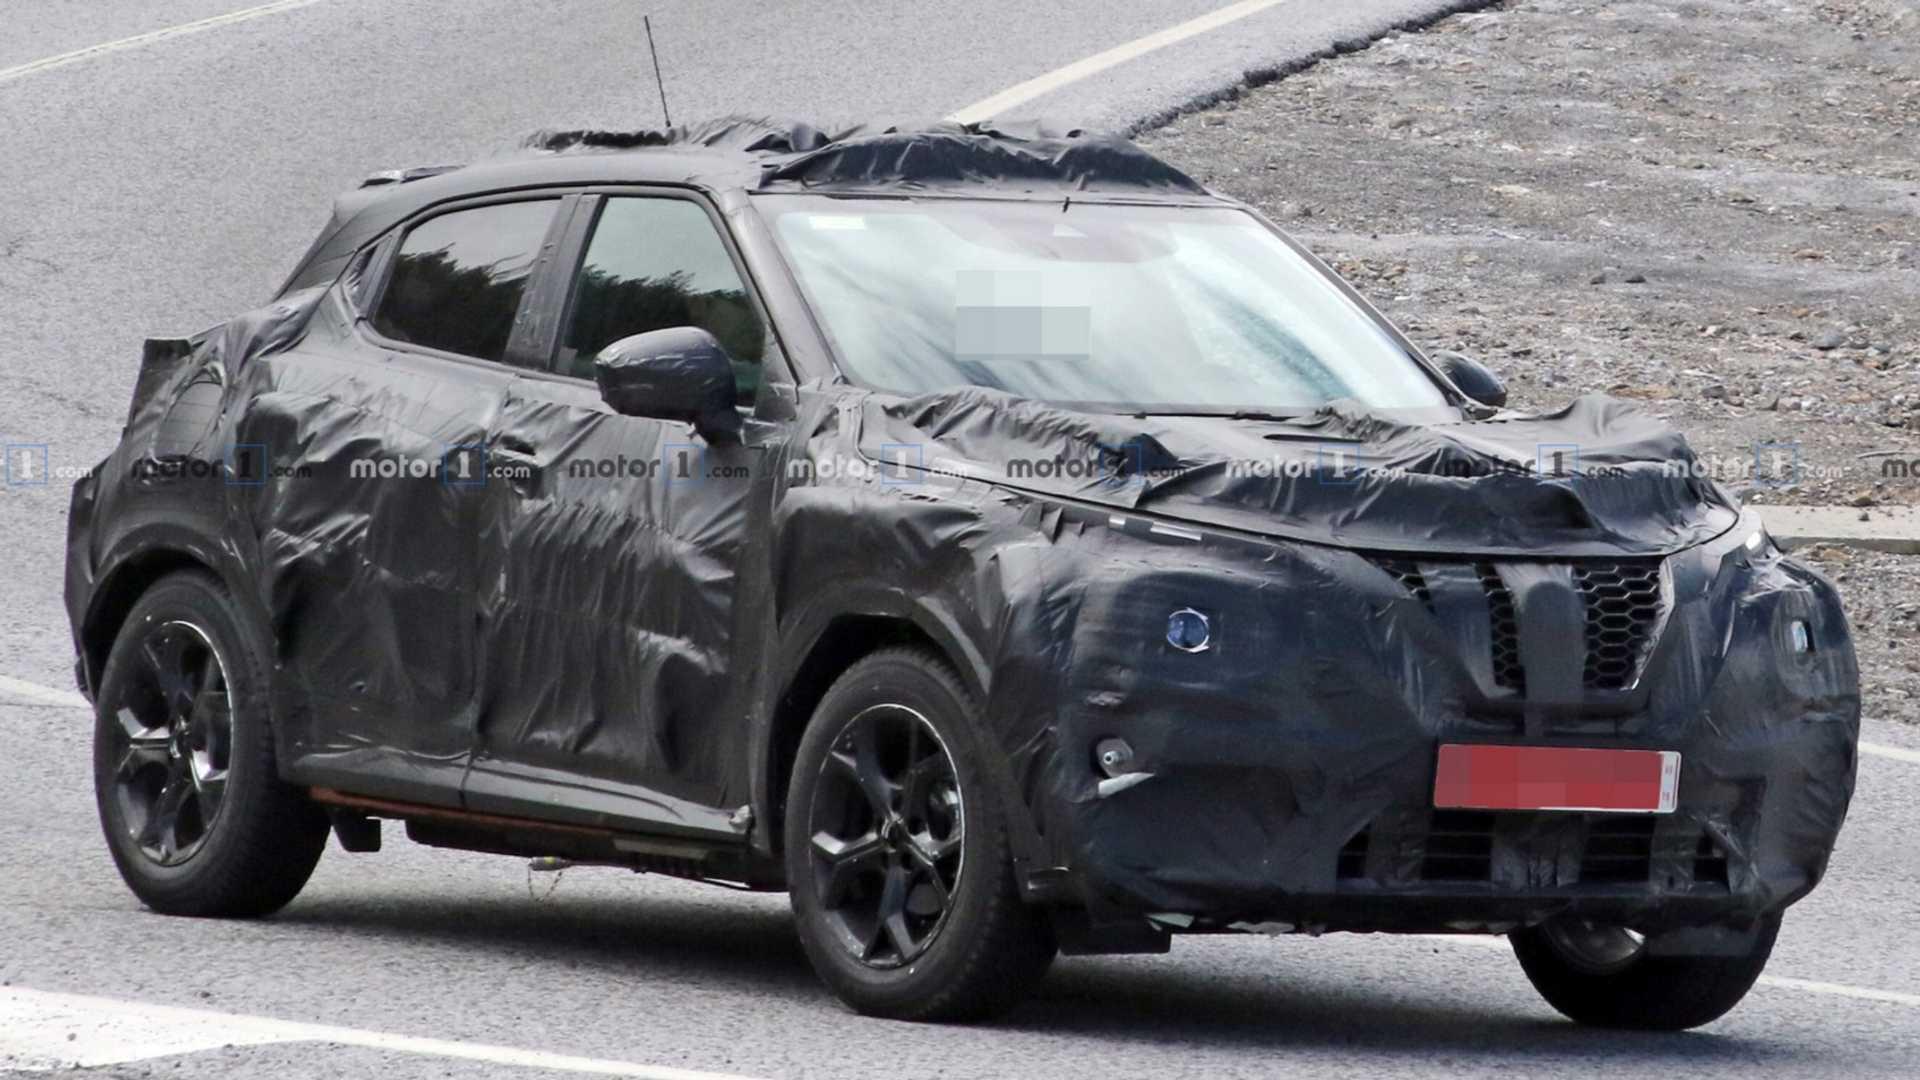 Nissan Juke Motor1 Com Photos